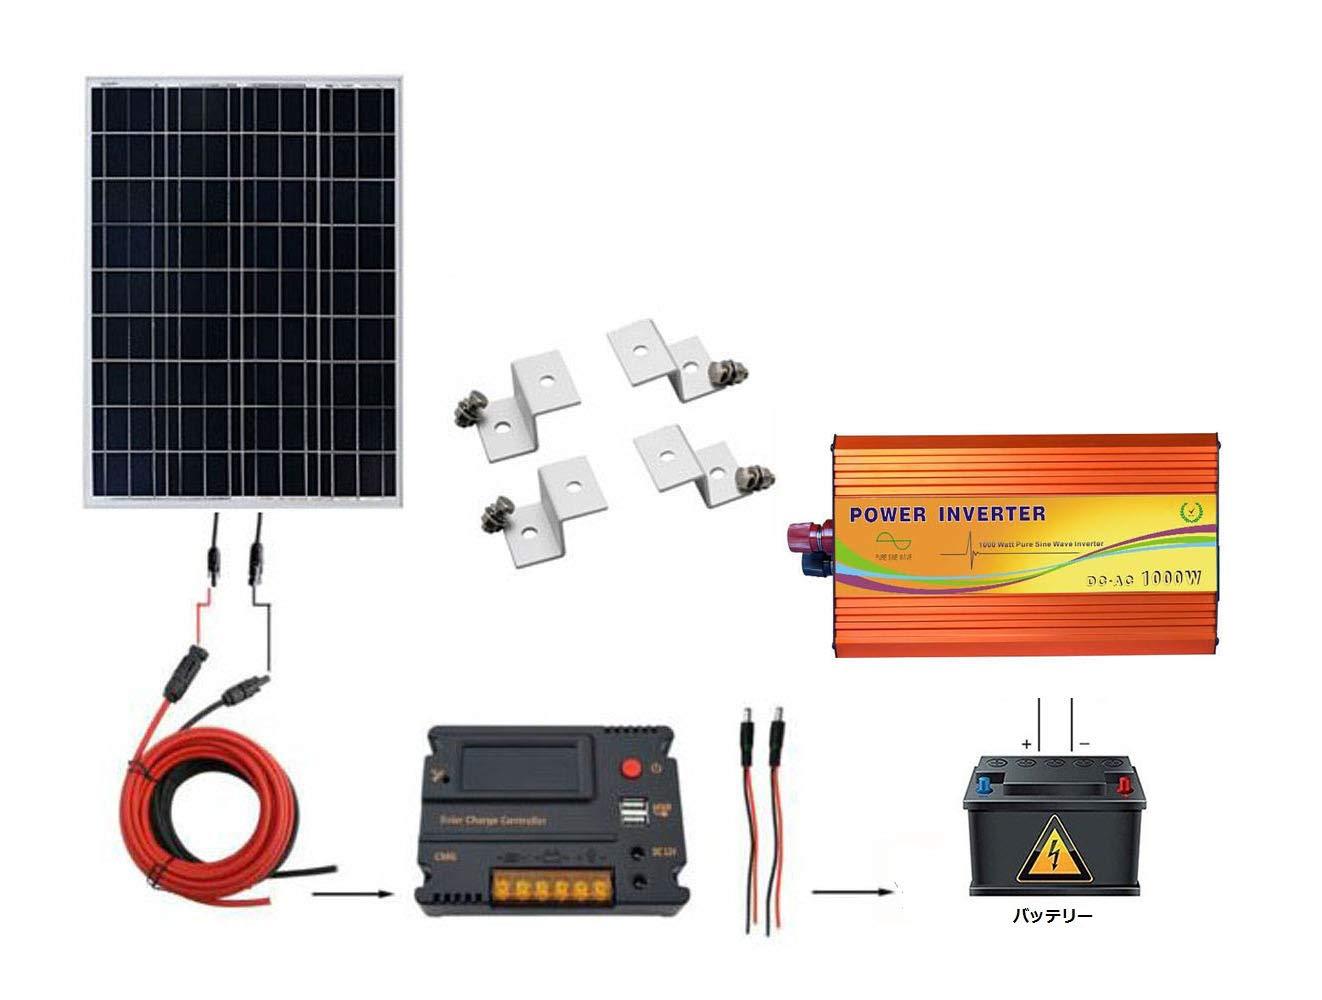 SAYA 90W ソーラーパネル 1個 90wモジュールキット 1kw正弦波インバーター 蓄電池充電 家庭用 B07LDLYM18